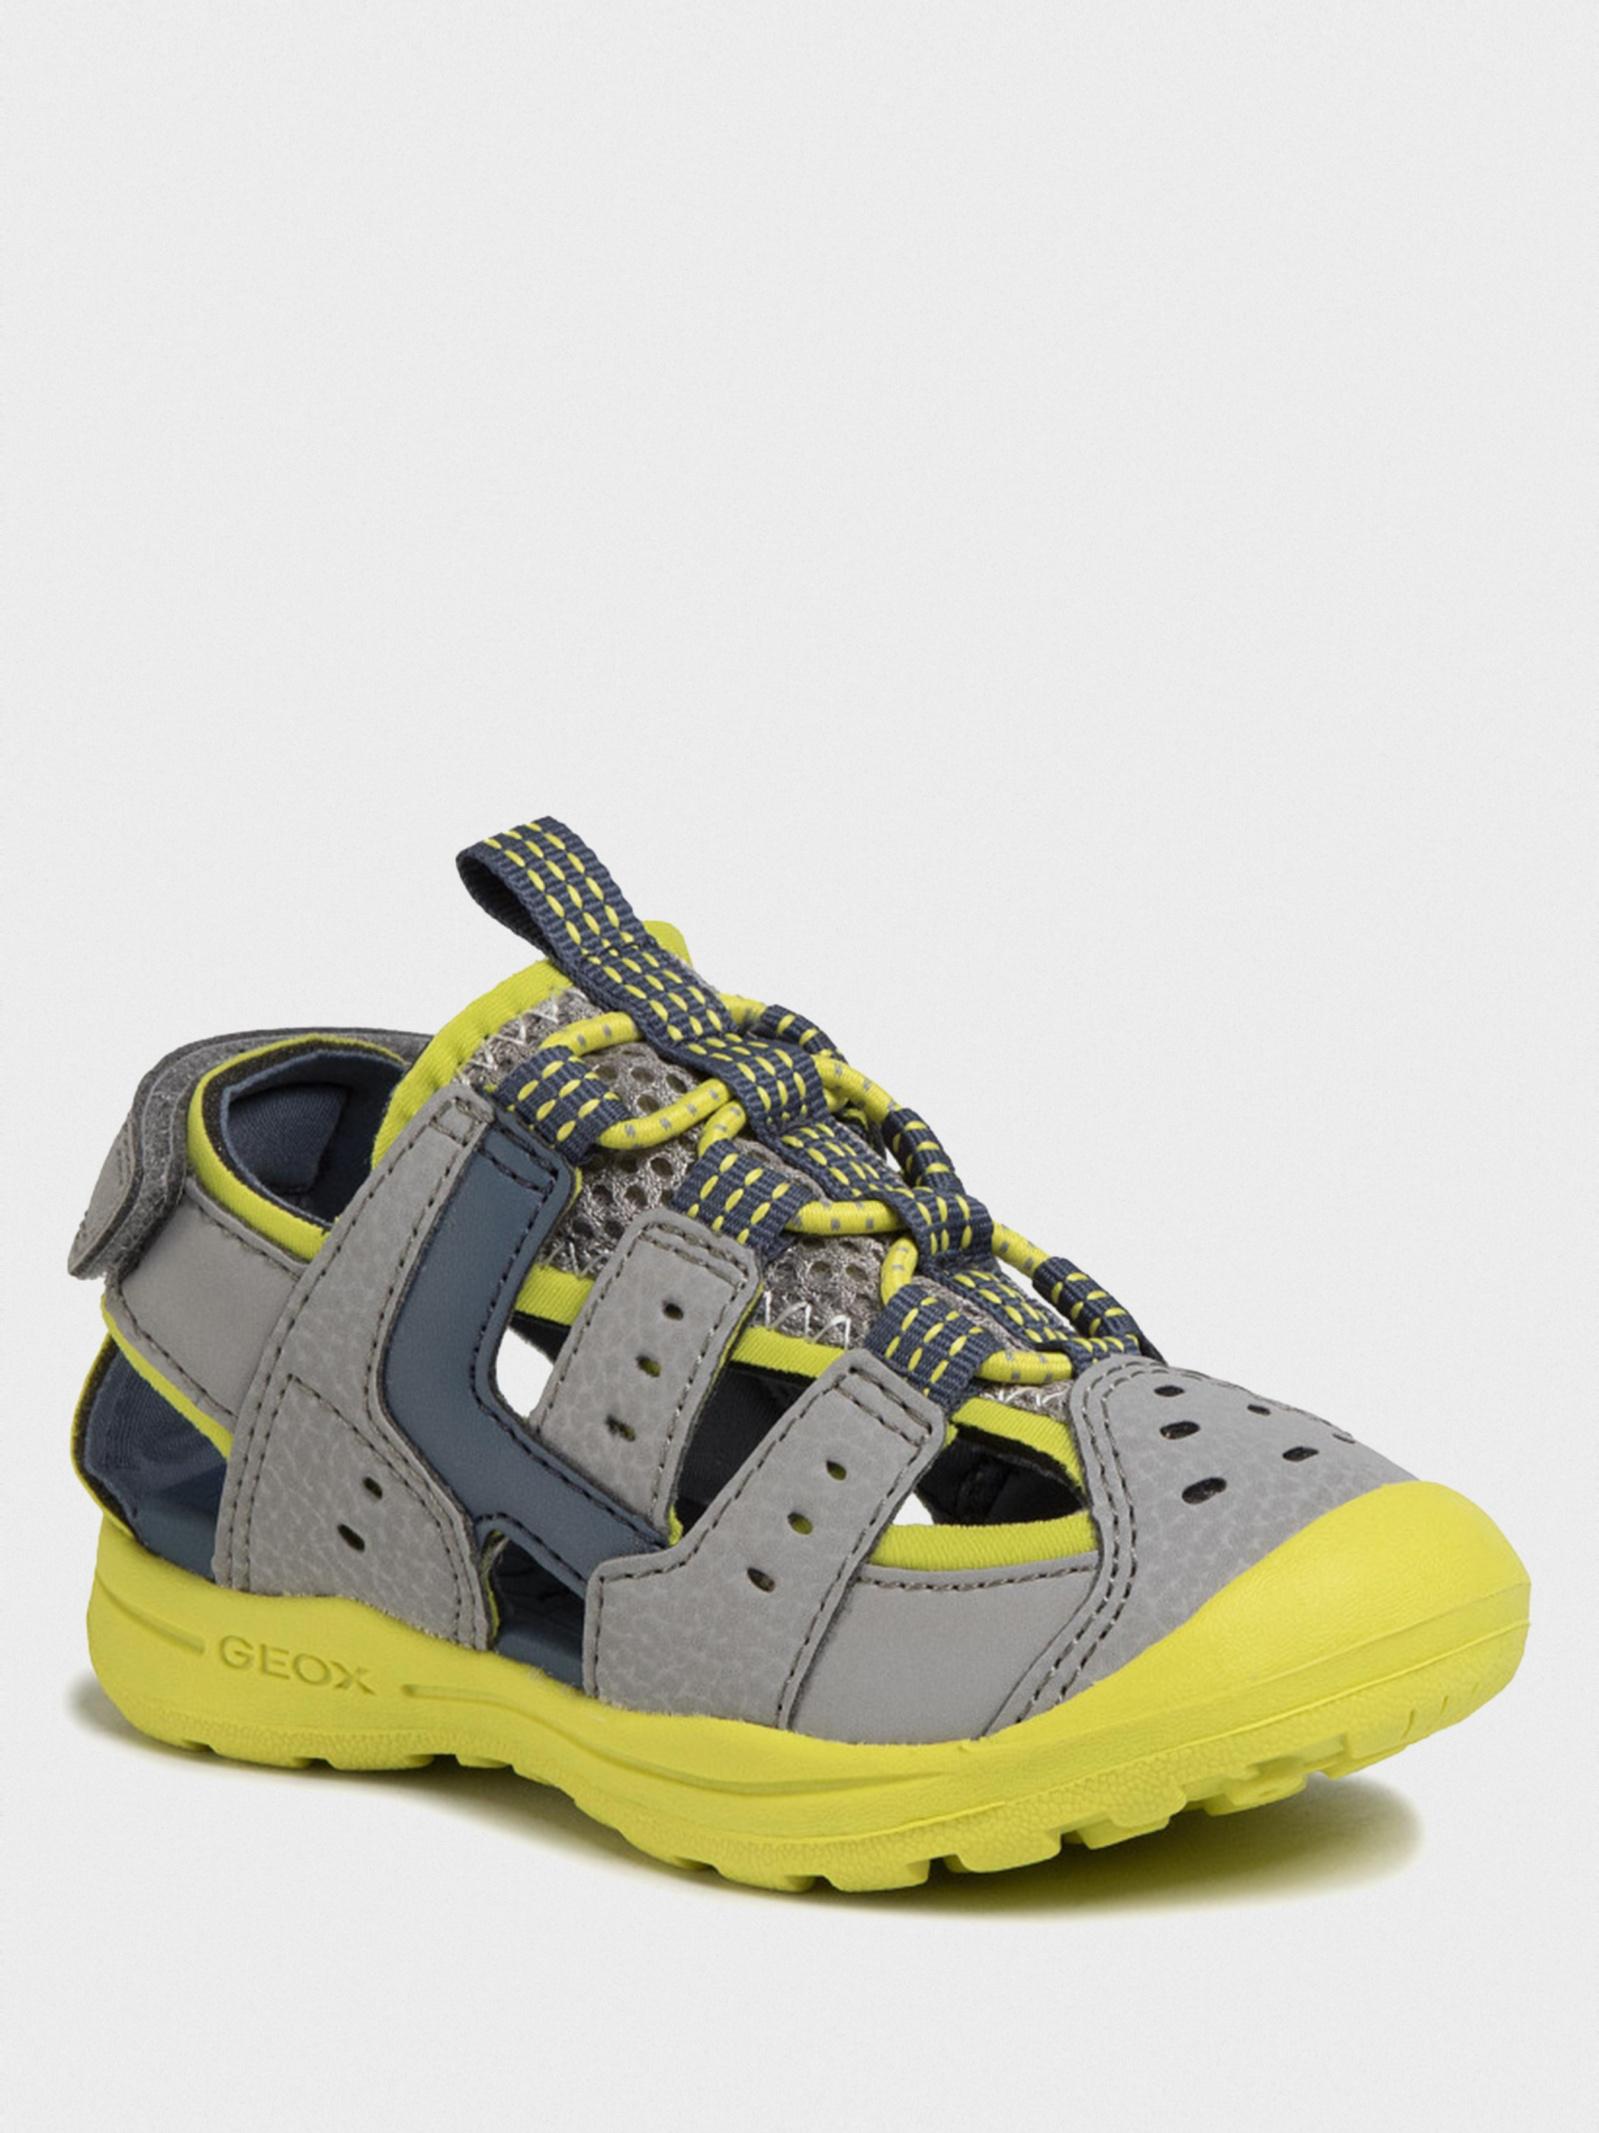 Сандалии детские Geox J VANIETT BOY J025XB-0CE15-C0666 модная обувь, 2017